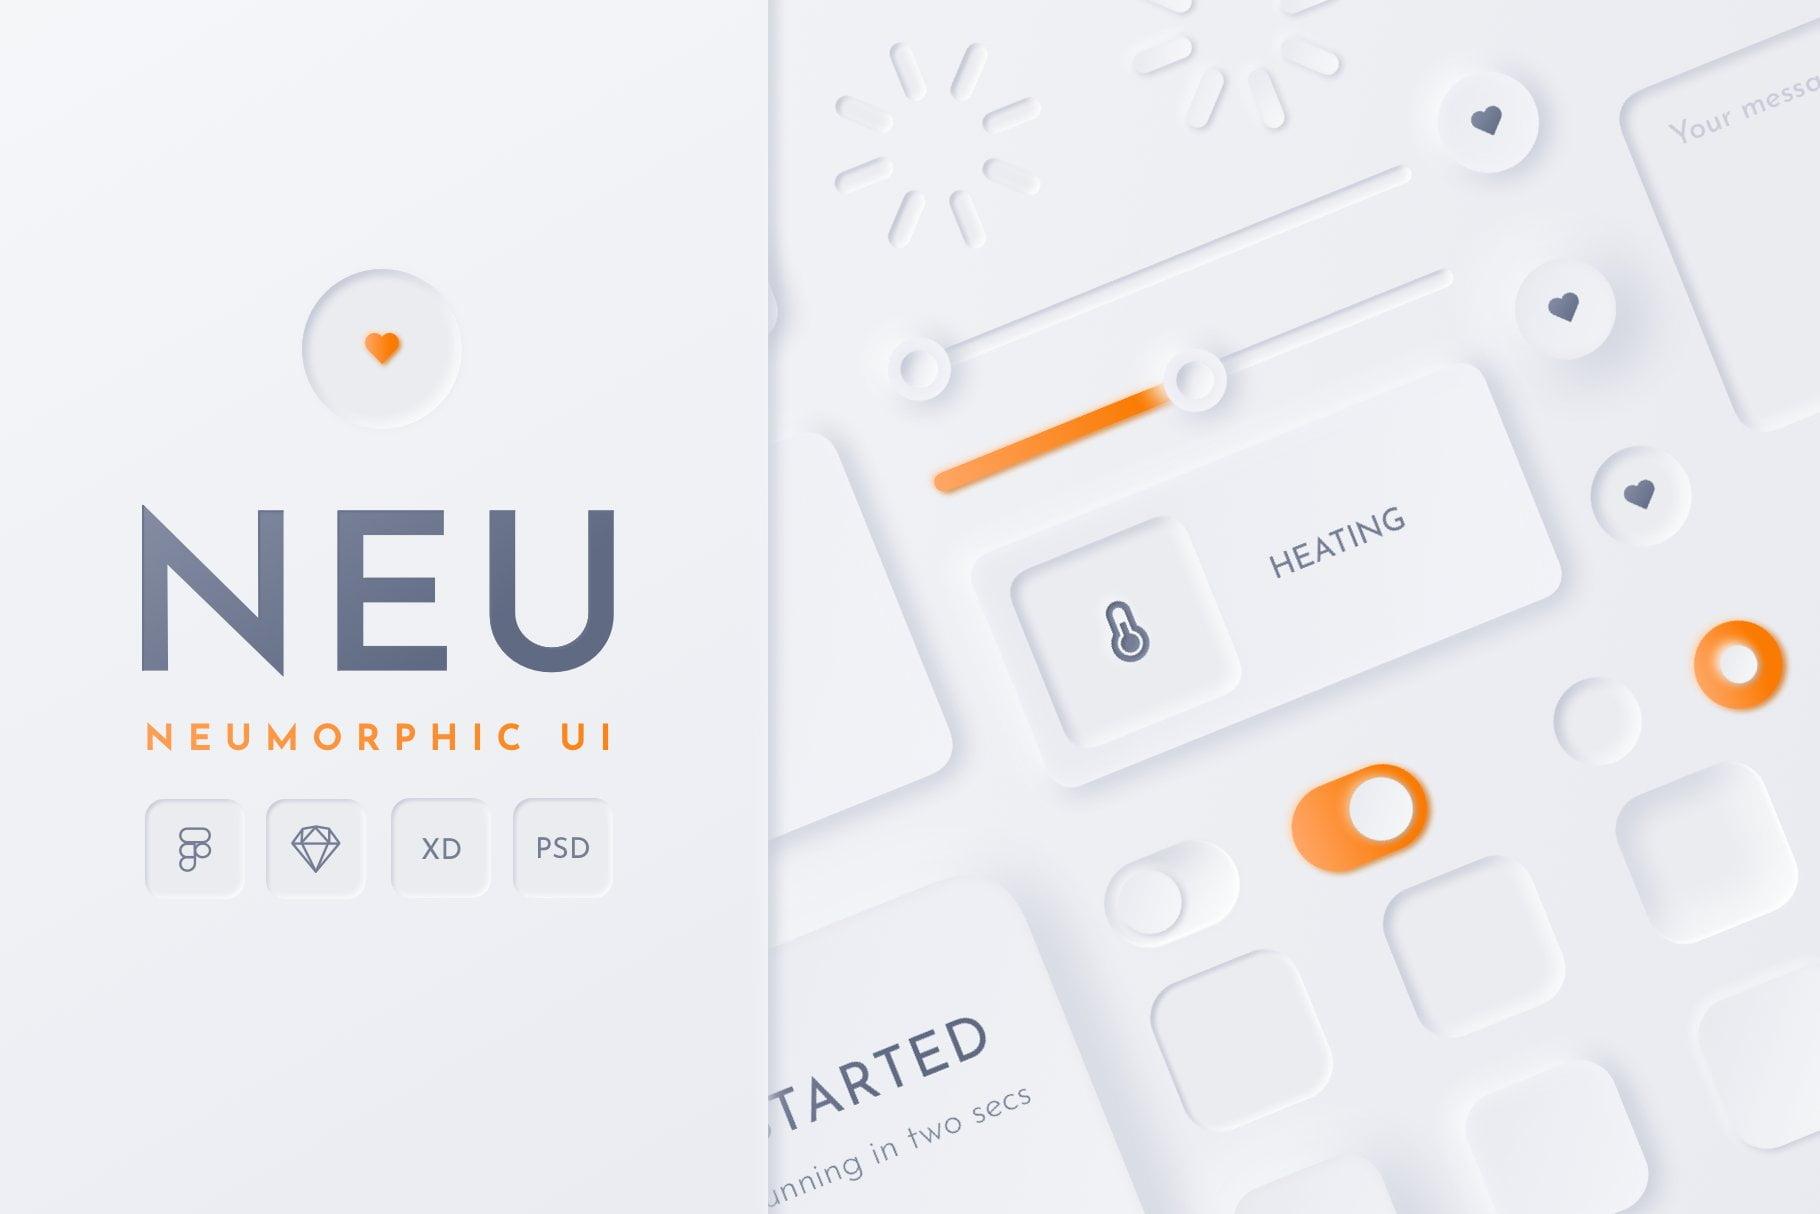 Neumorphism-UI-Design-Sample-1 - 43+ BEST FREE Neumorphism UI Design SAMPLE [year]